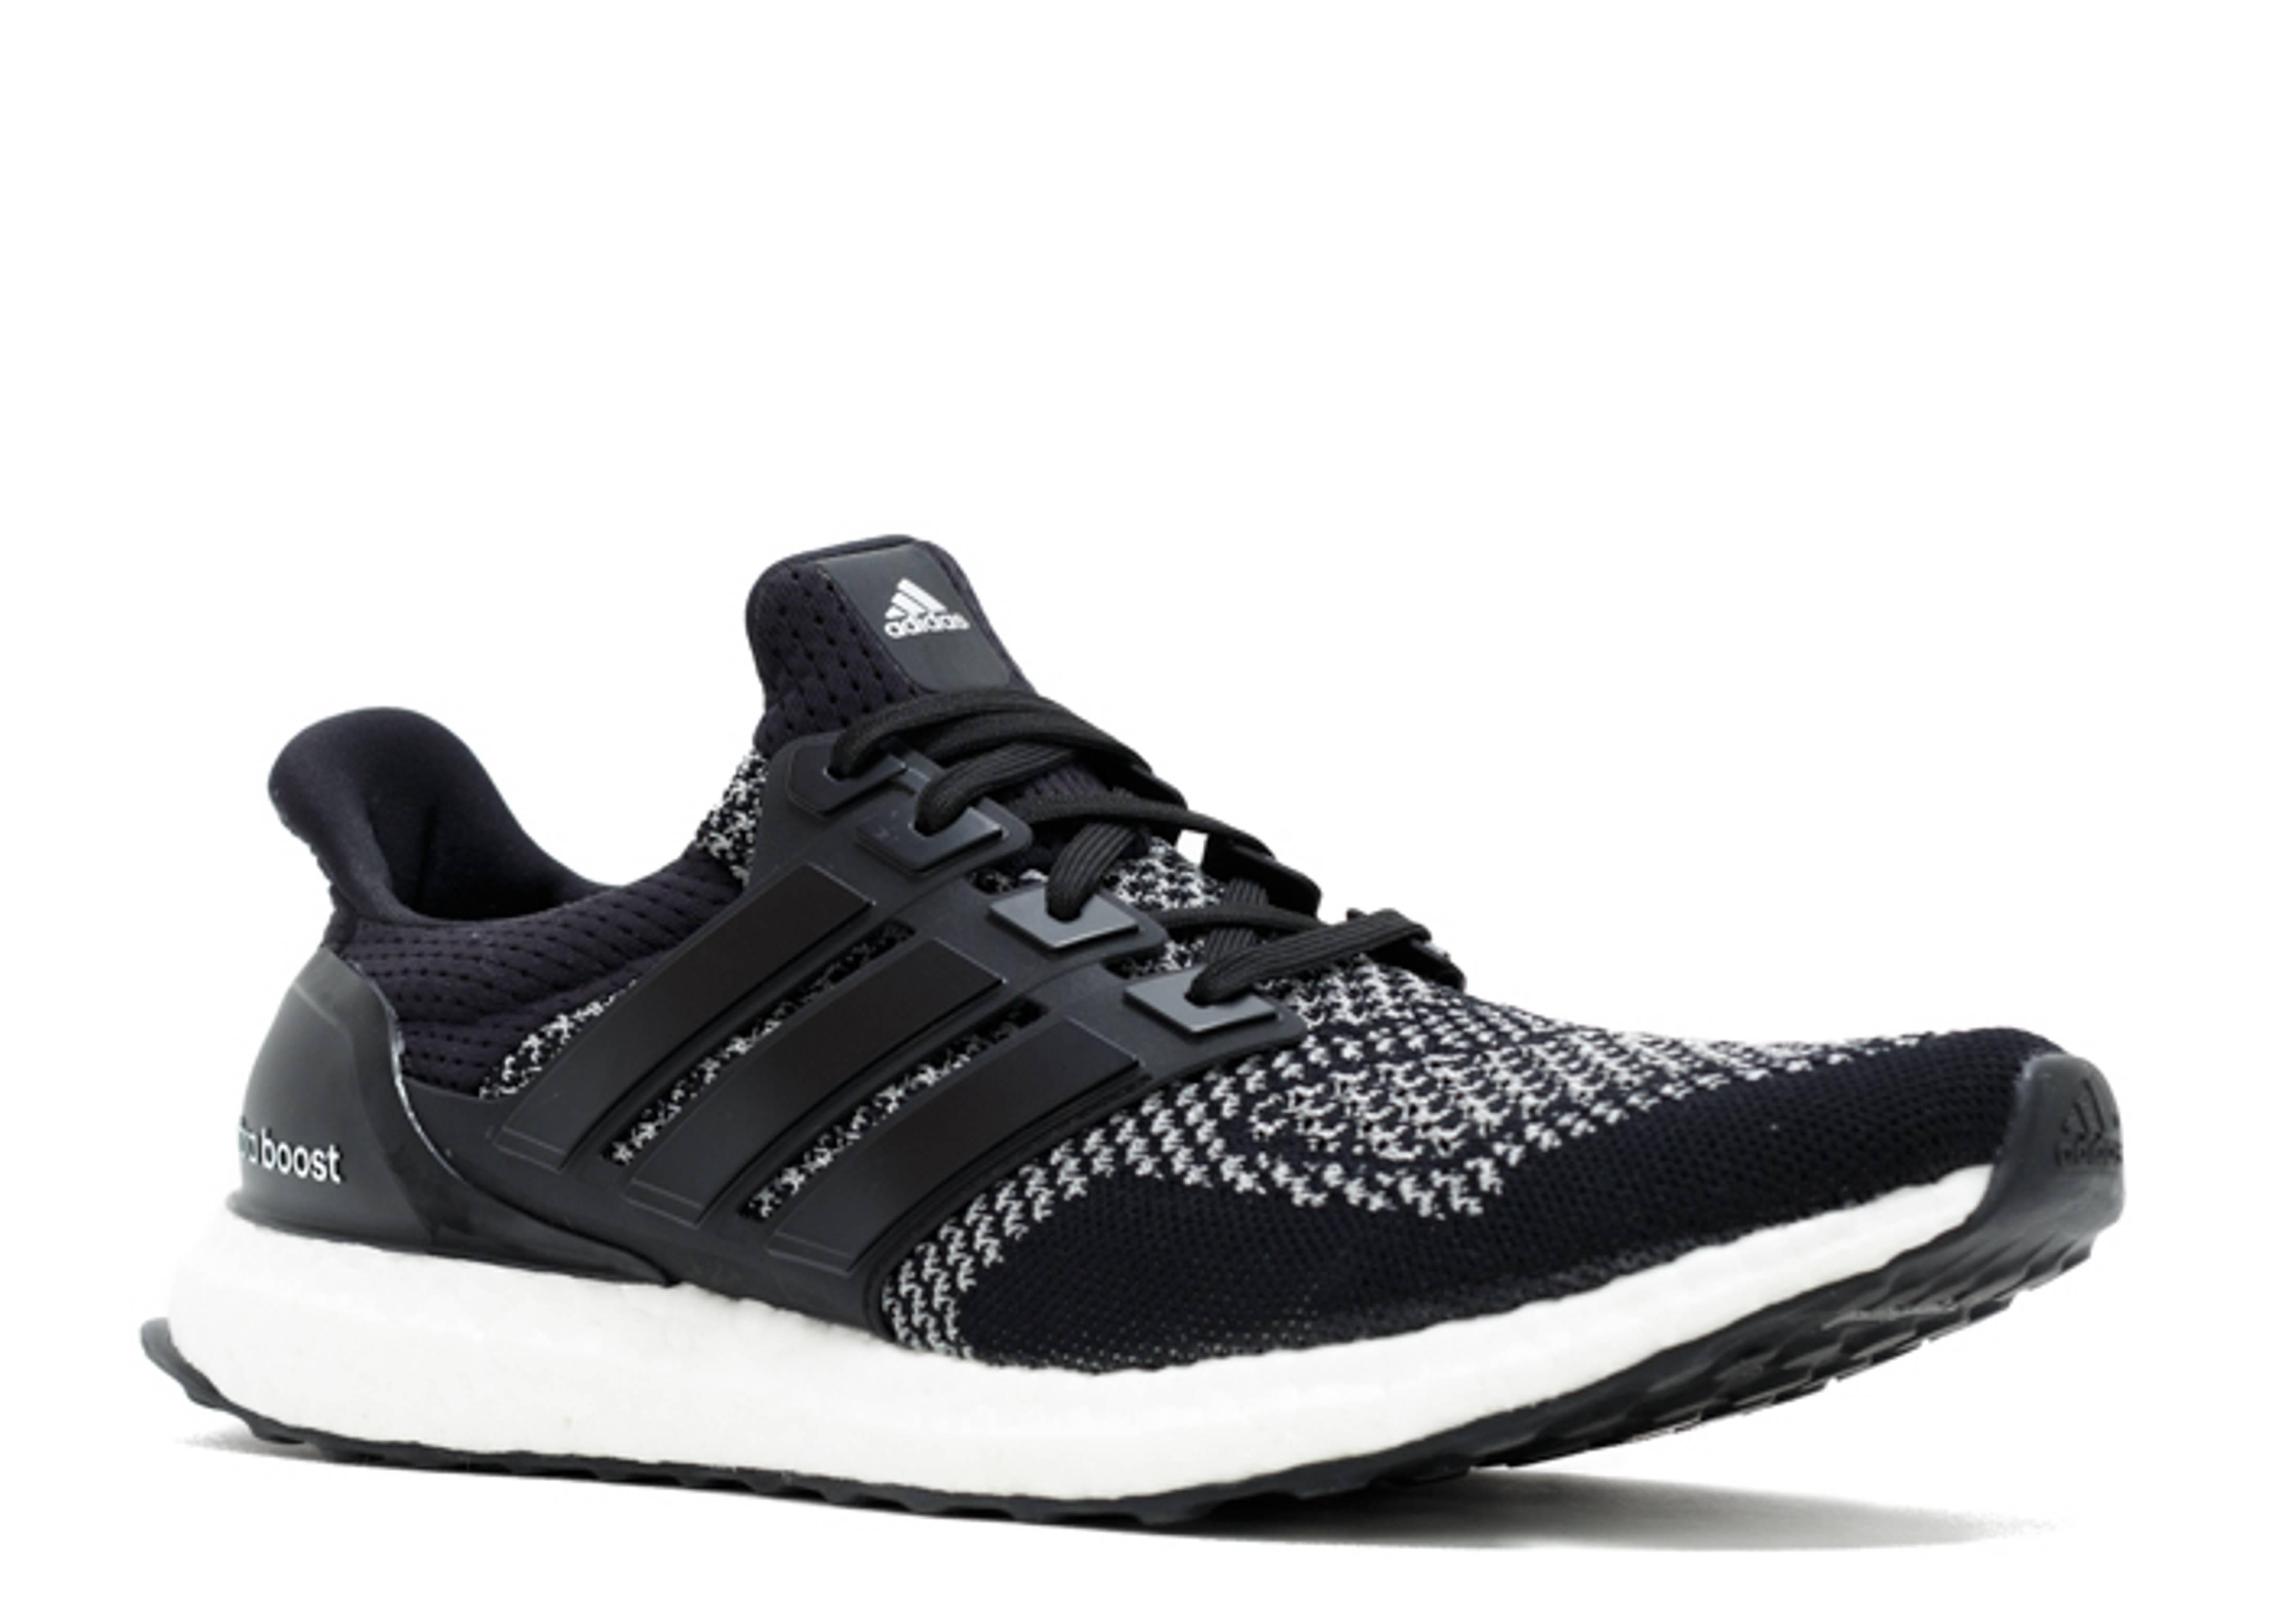 2d055d271 Adidas Ultra Boost Black Reflective salaryservices.co.uk